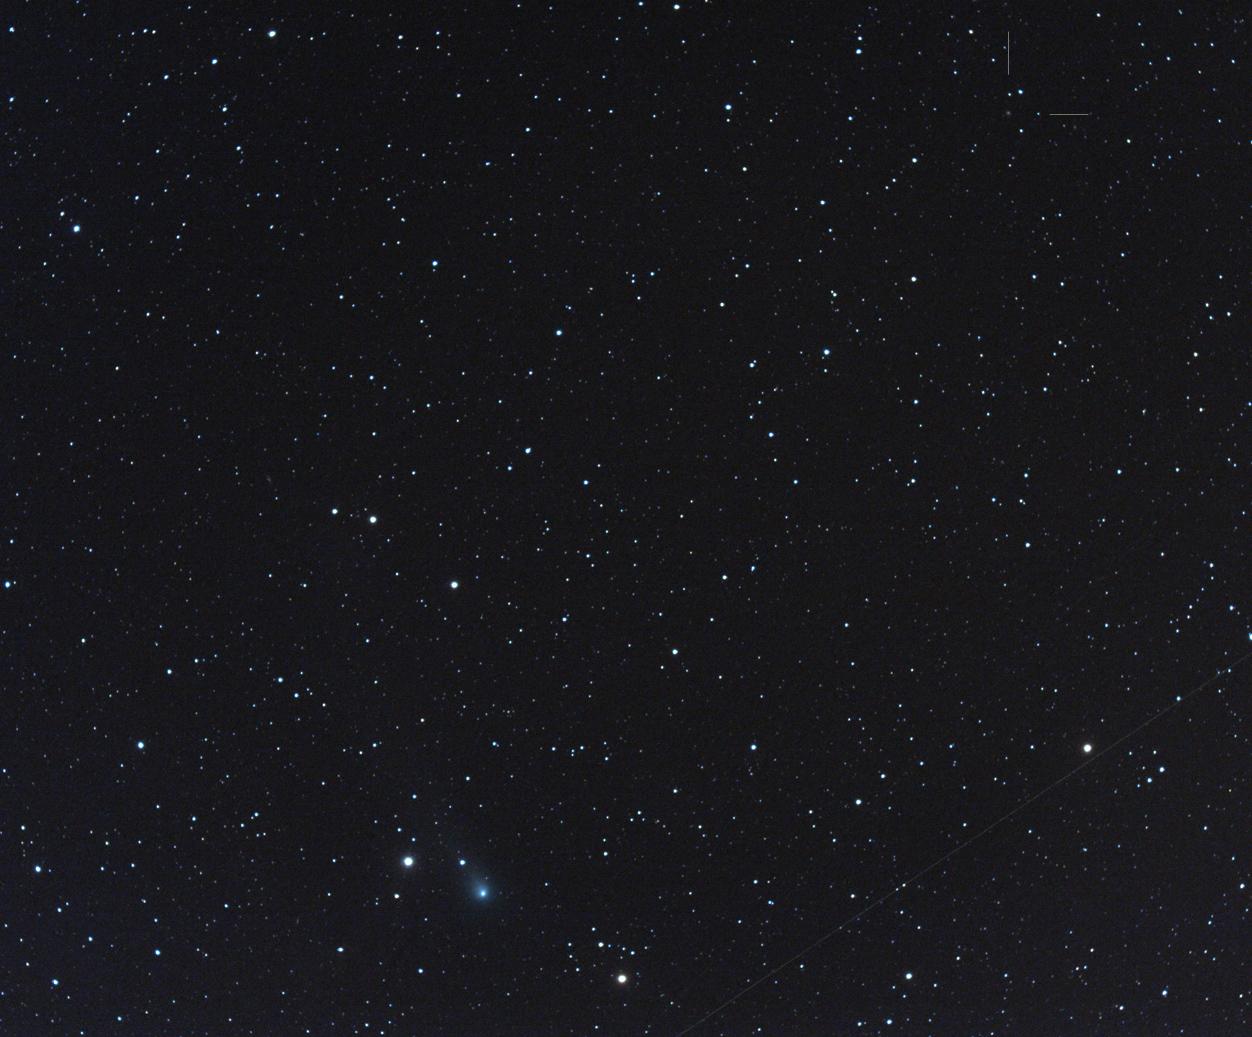 Komety C/2012 X1 (LINEAR) a C/2012 K1 (PanSTARRS), foto: MaG